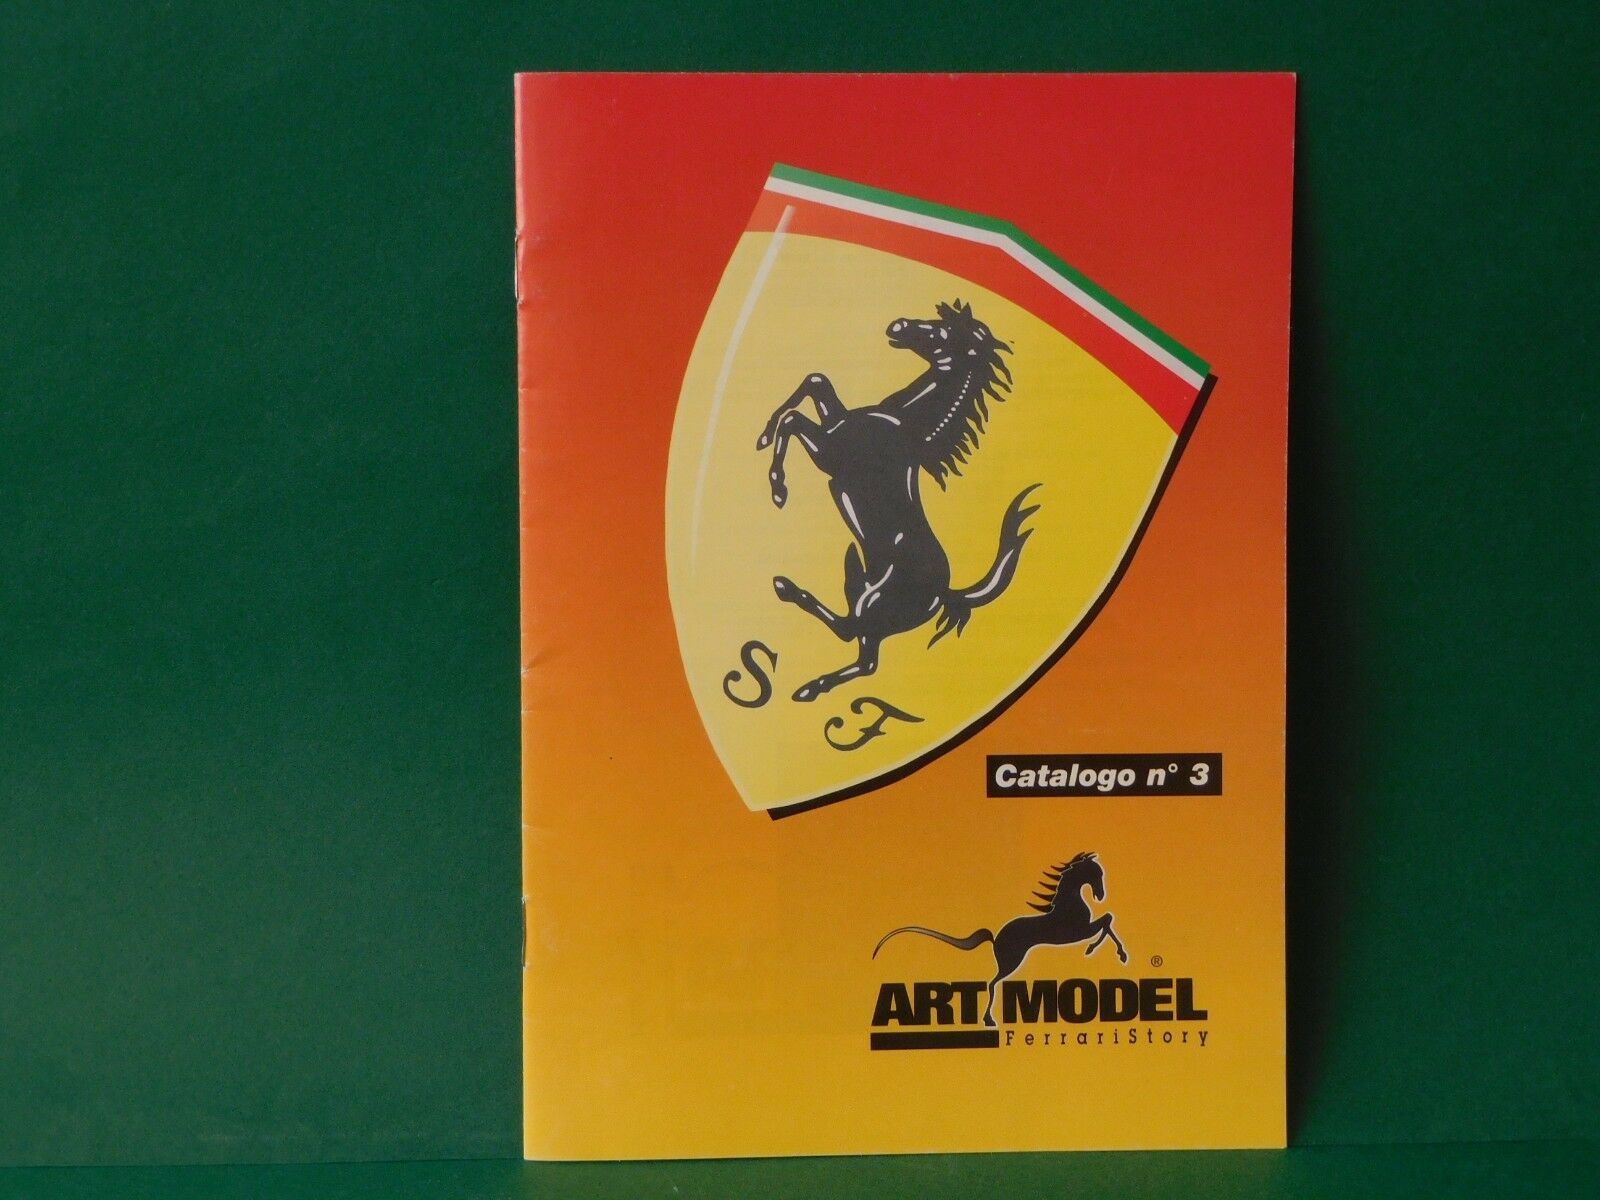 Art Art Art Model nº 3 1996 1 43 catálogo modelo auto catálogo Catalogue maquetas de coches 4a228c